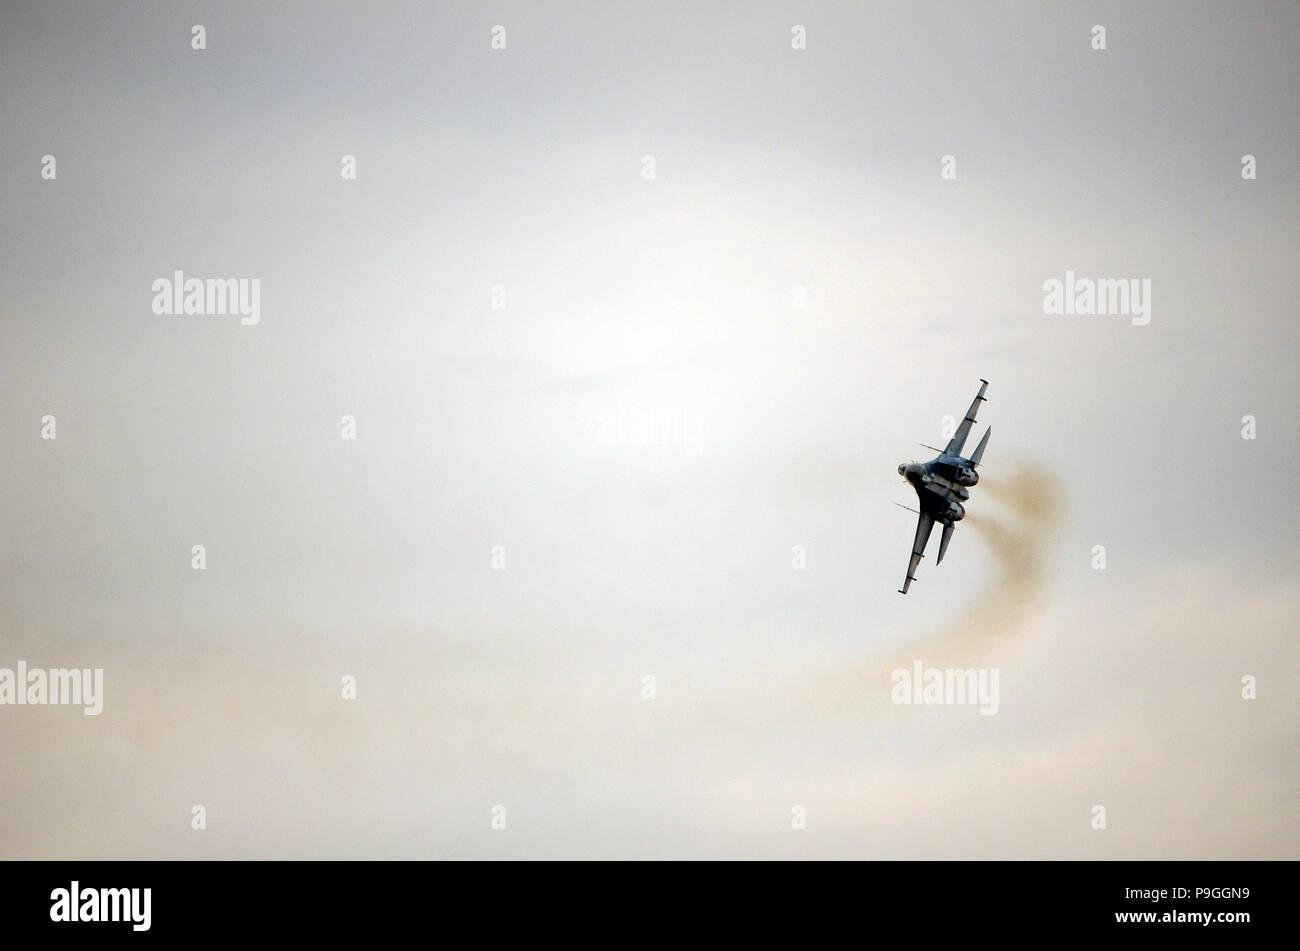 cold war aircraft, Sukhoi Su-27  Flanker - Stock Image